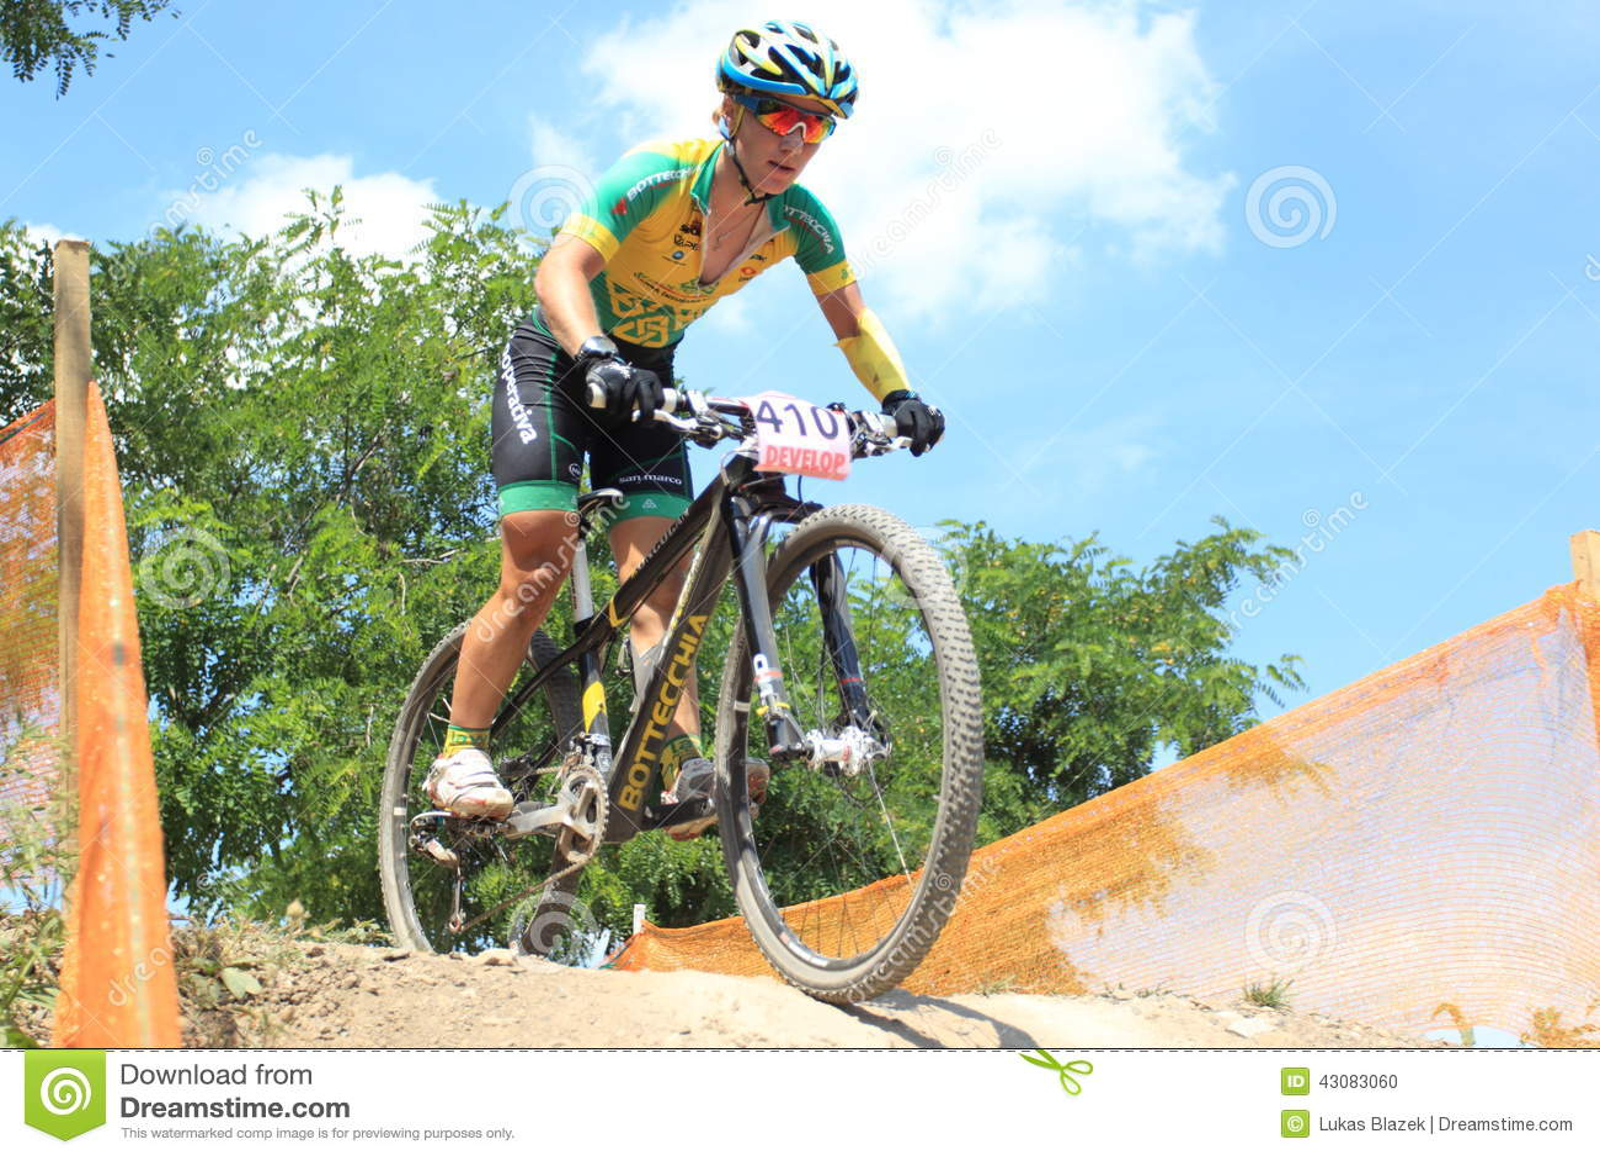 Czech women MTB cross country